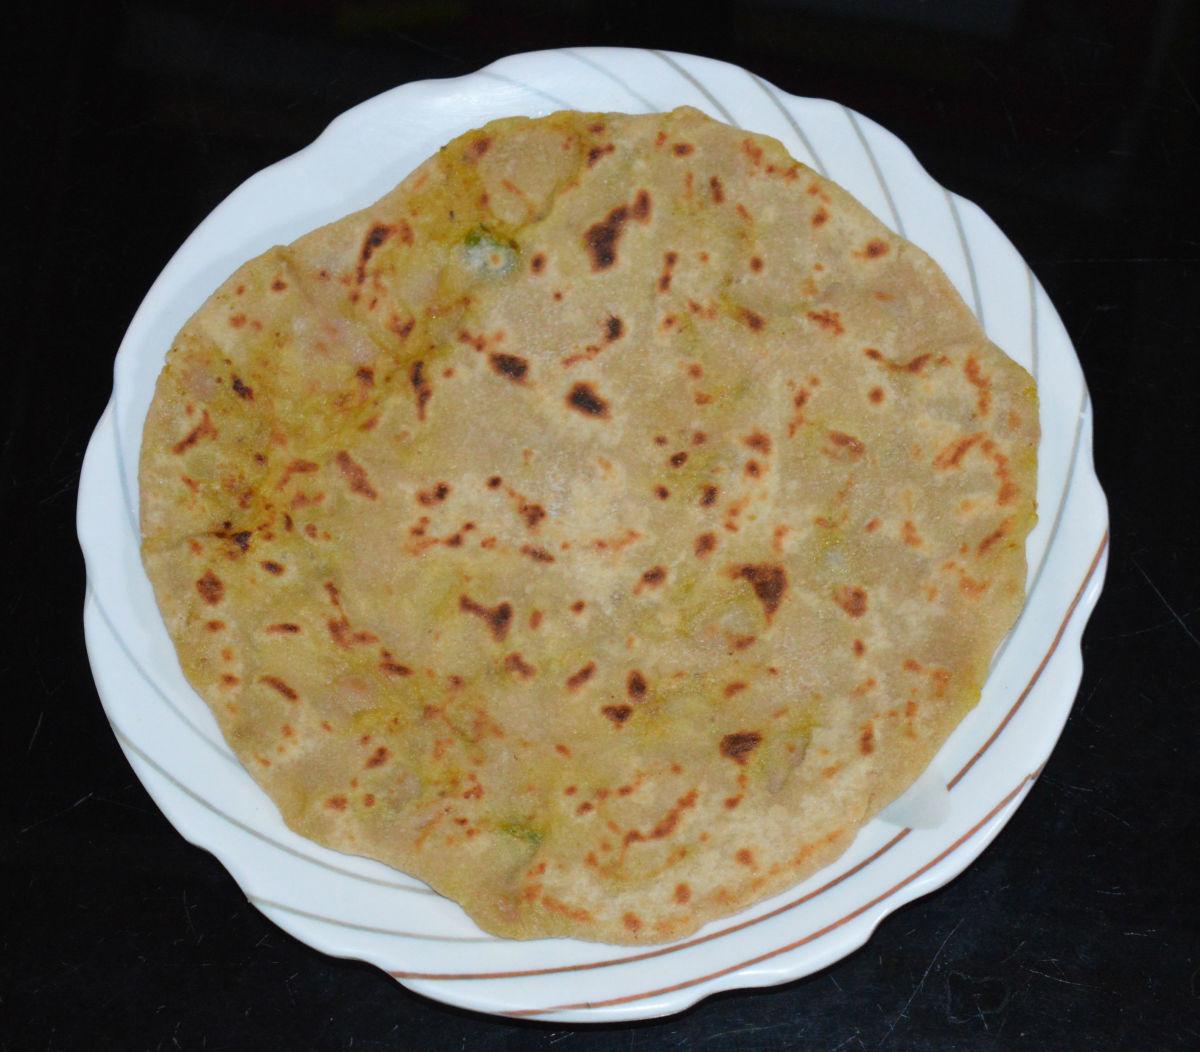 Green Banana Paratha (Flat Bread) Recipe